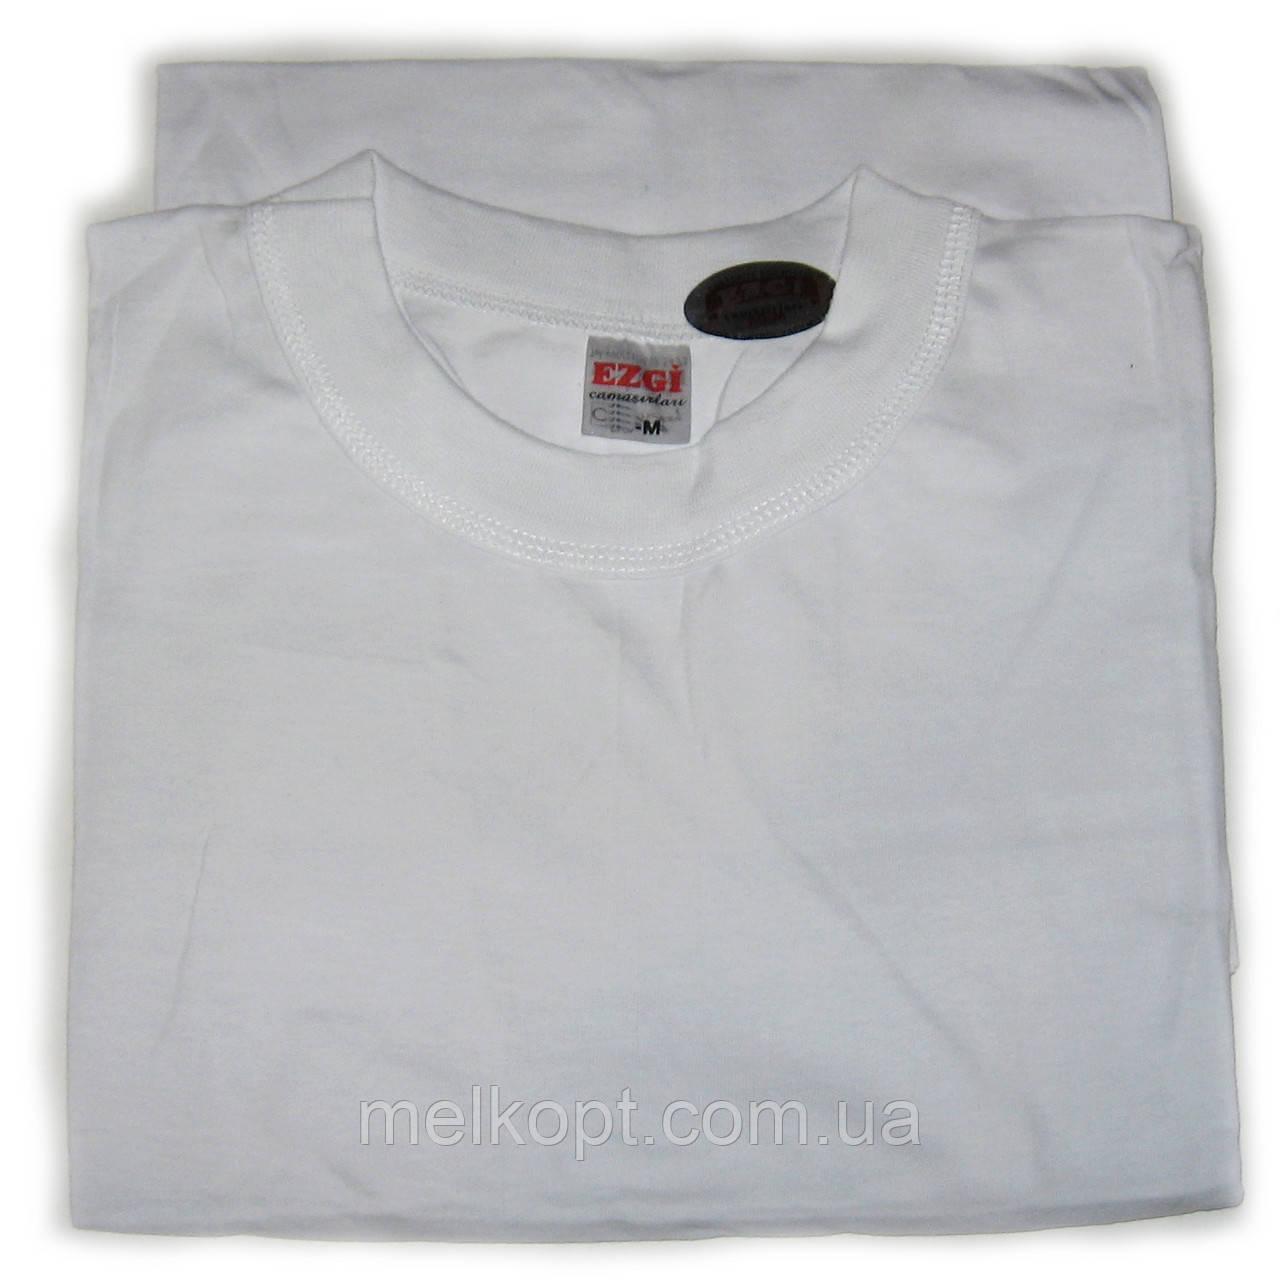 Мужские футболки Ezgi - 51,00 грн./шт. (56-й размер, белые)